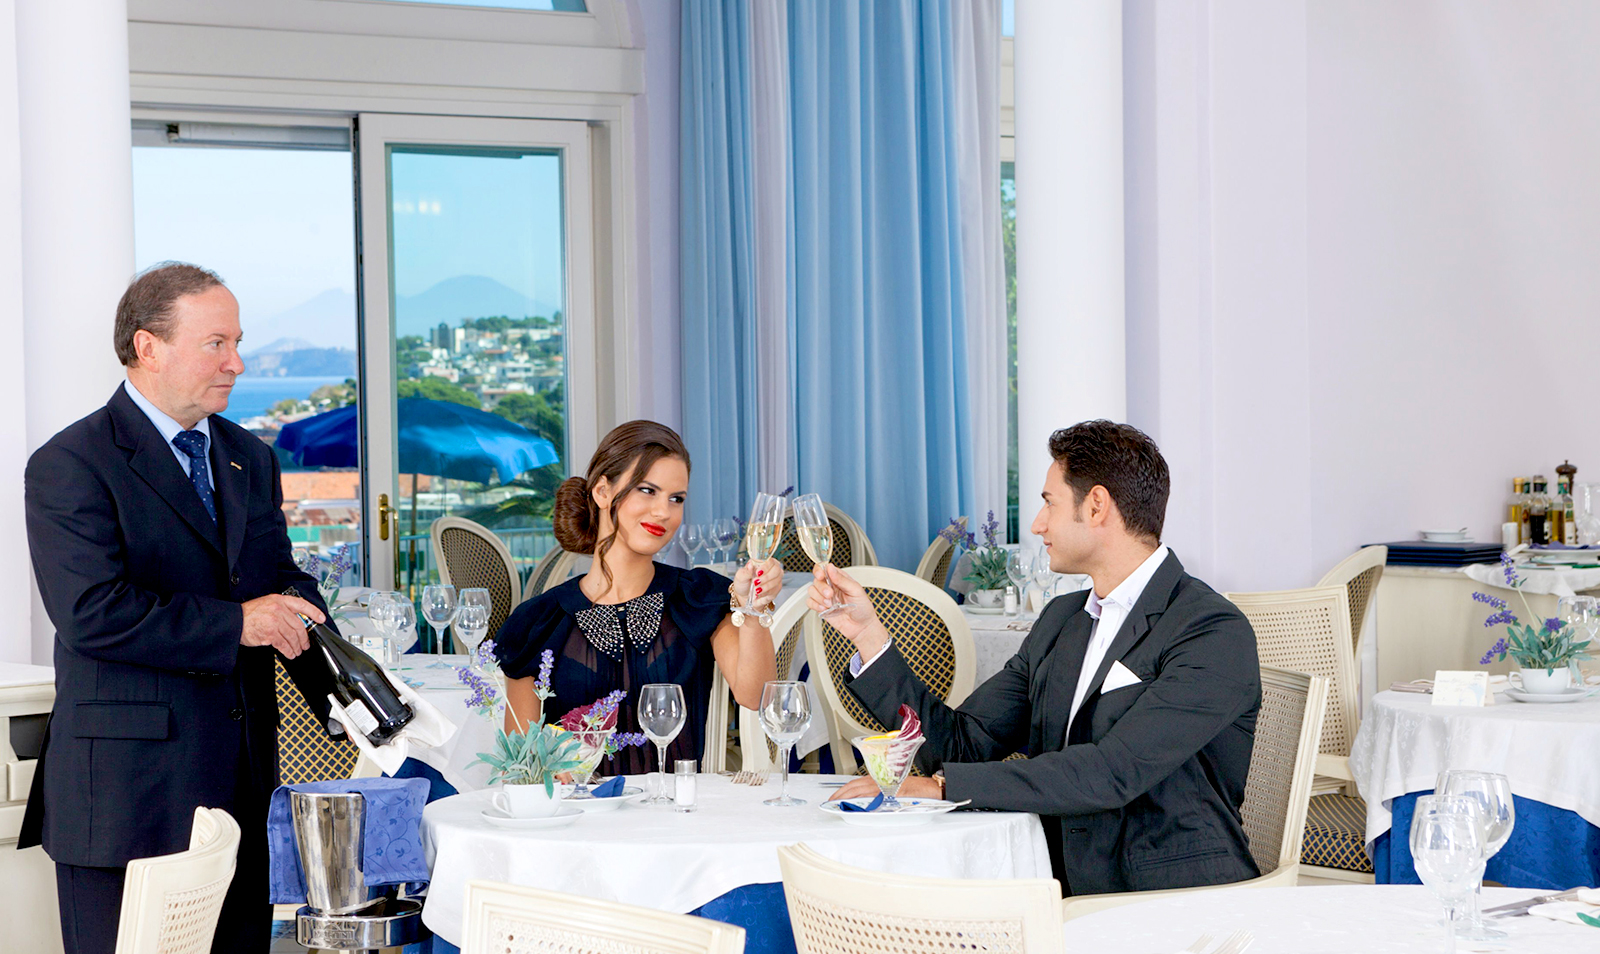 hotel-terme-gran-paradiso-ischia-casamicciola-ristorante